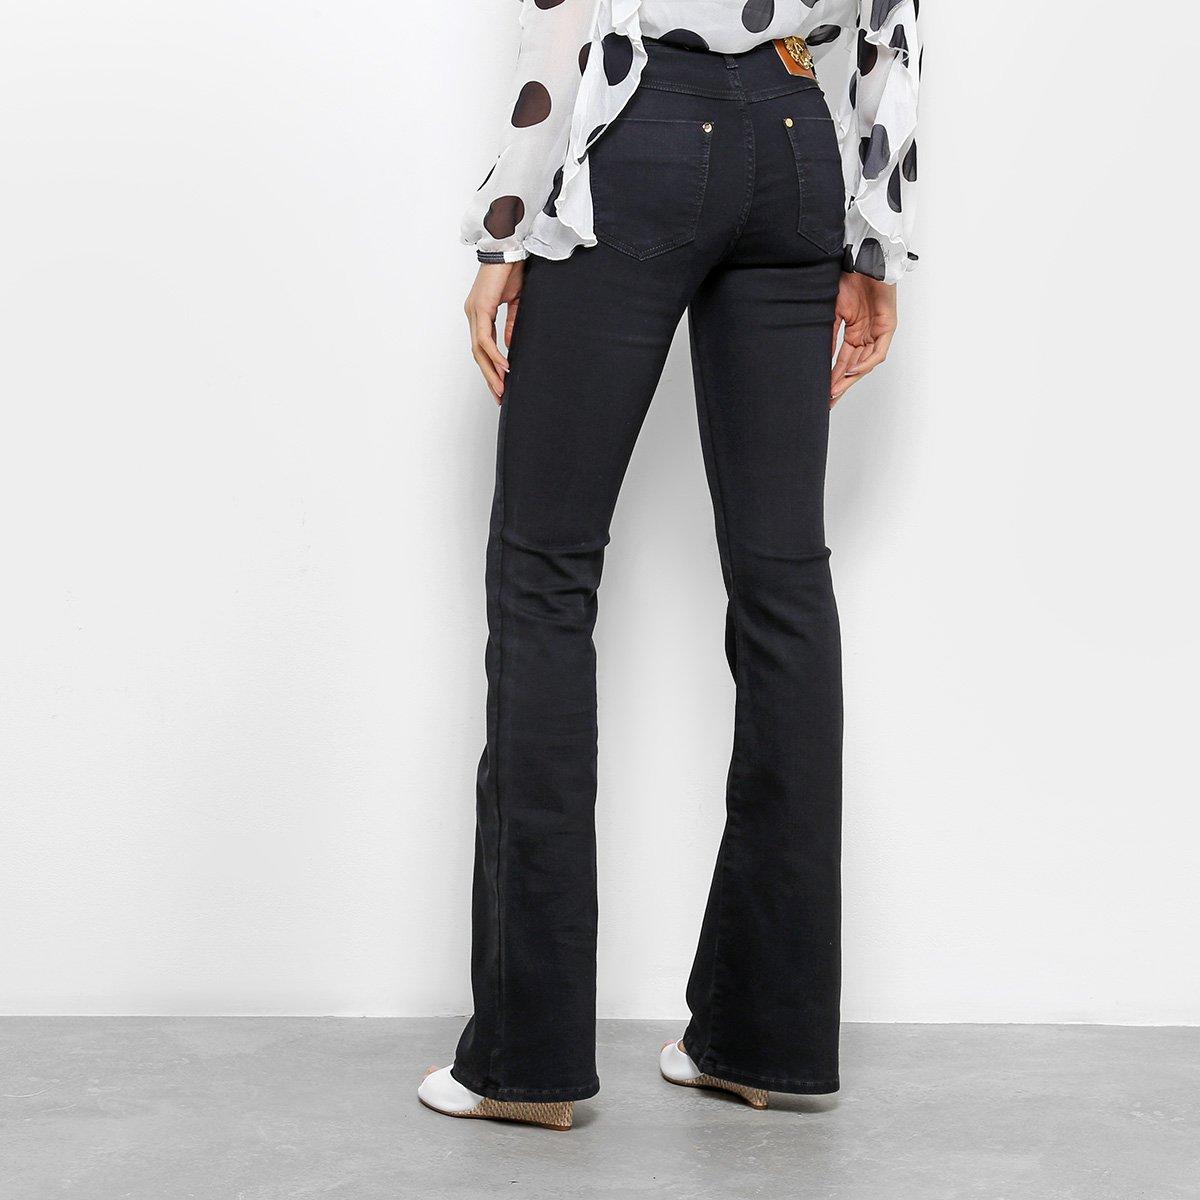 fa6b1b220 ... Foto 2 - Calça Jeans Flare Forum Básica Cintura Média Feminina